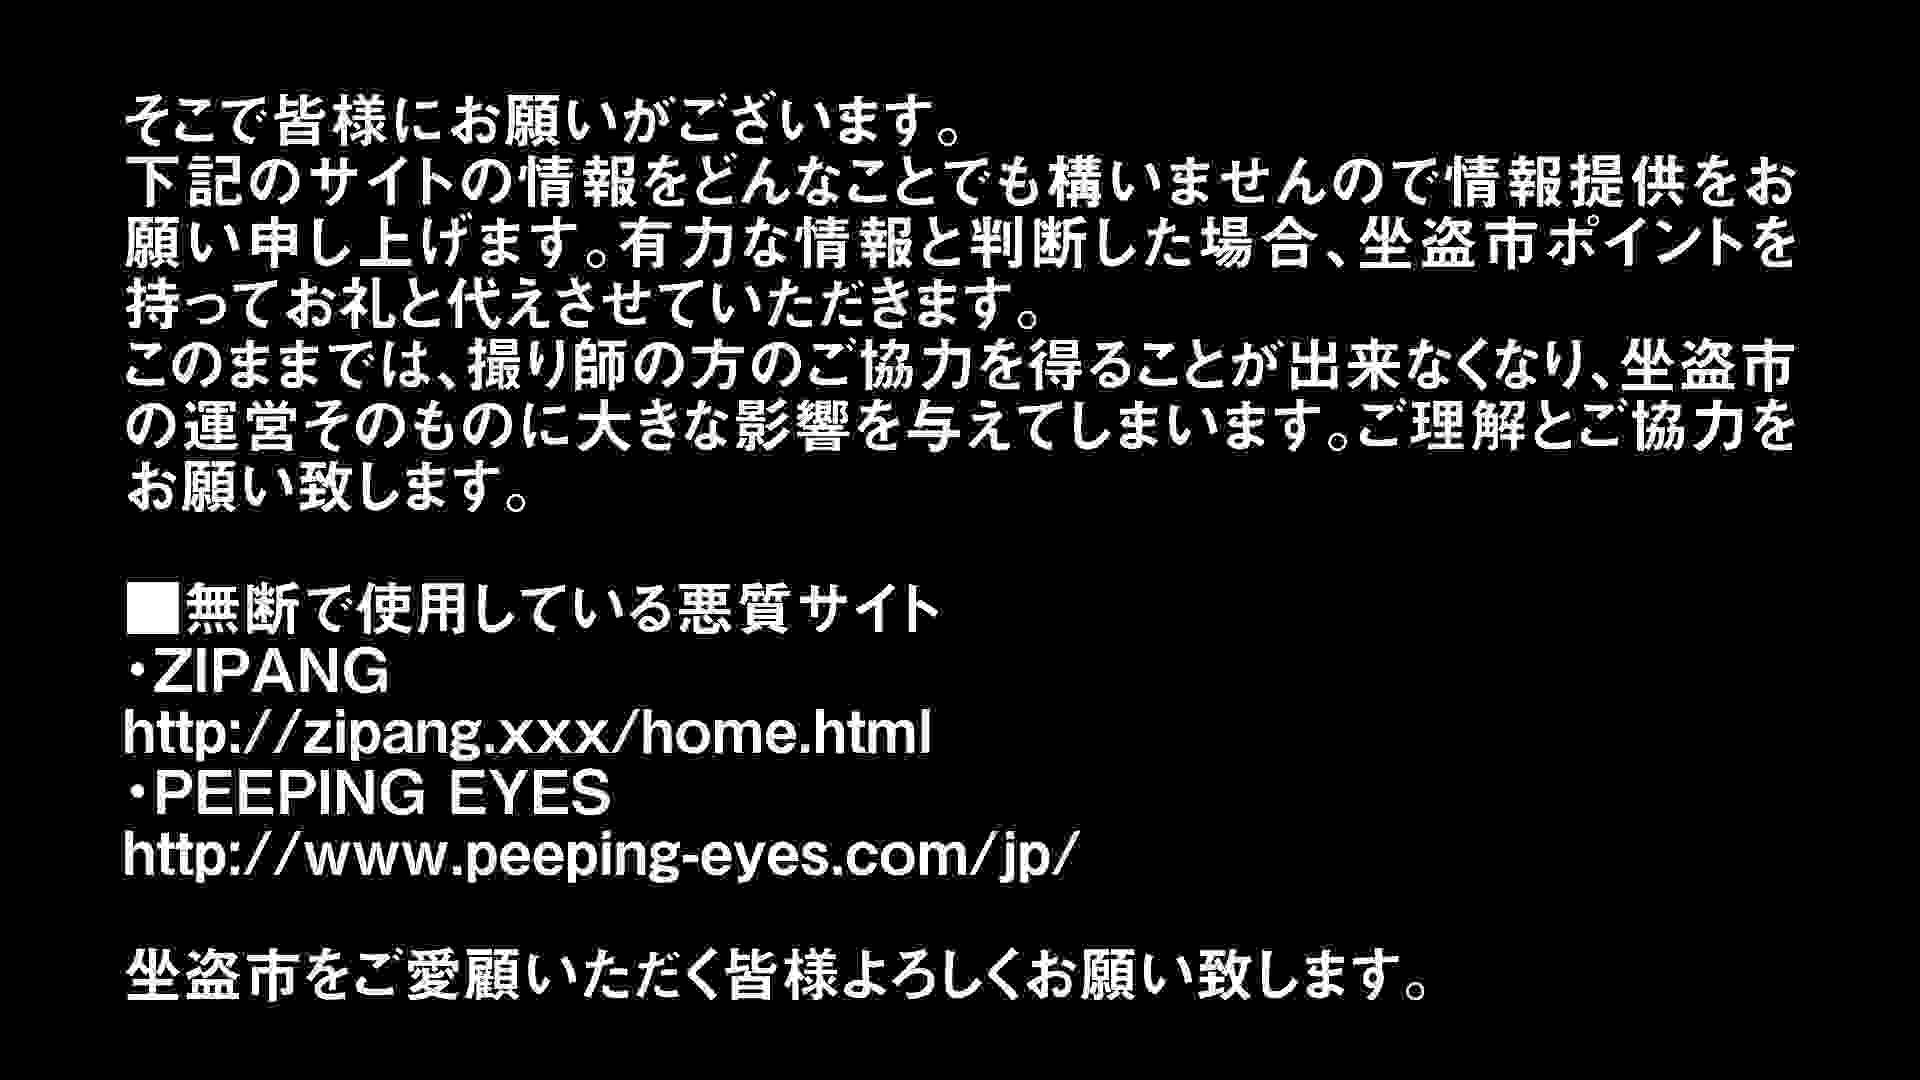 Aquaな露天風呂Vol.294 OLセックス  75画像 27